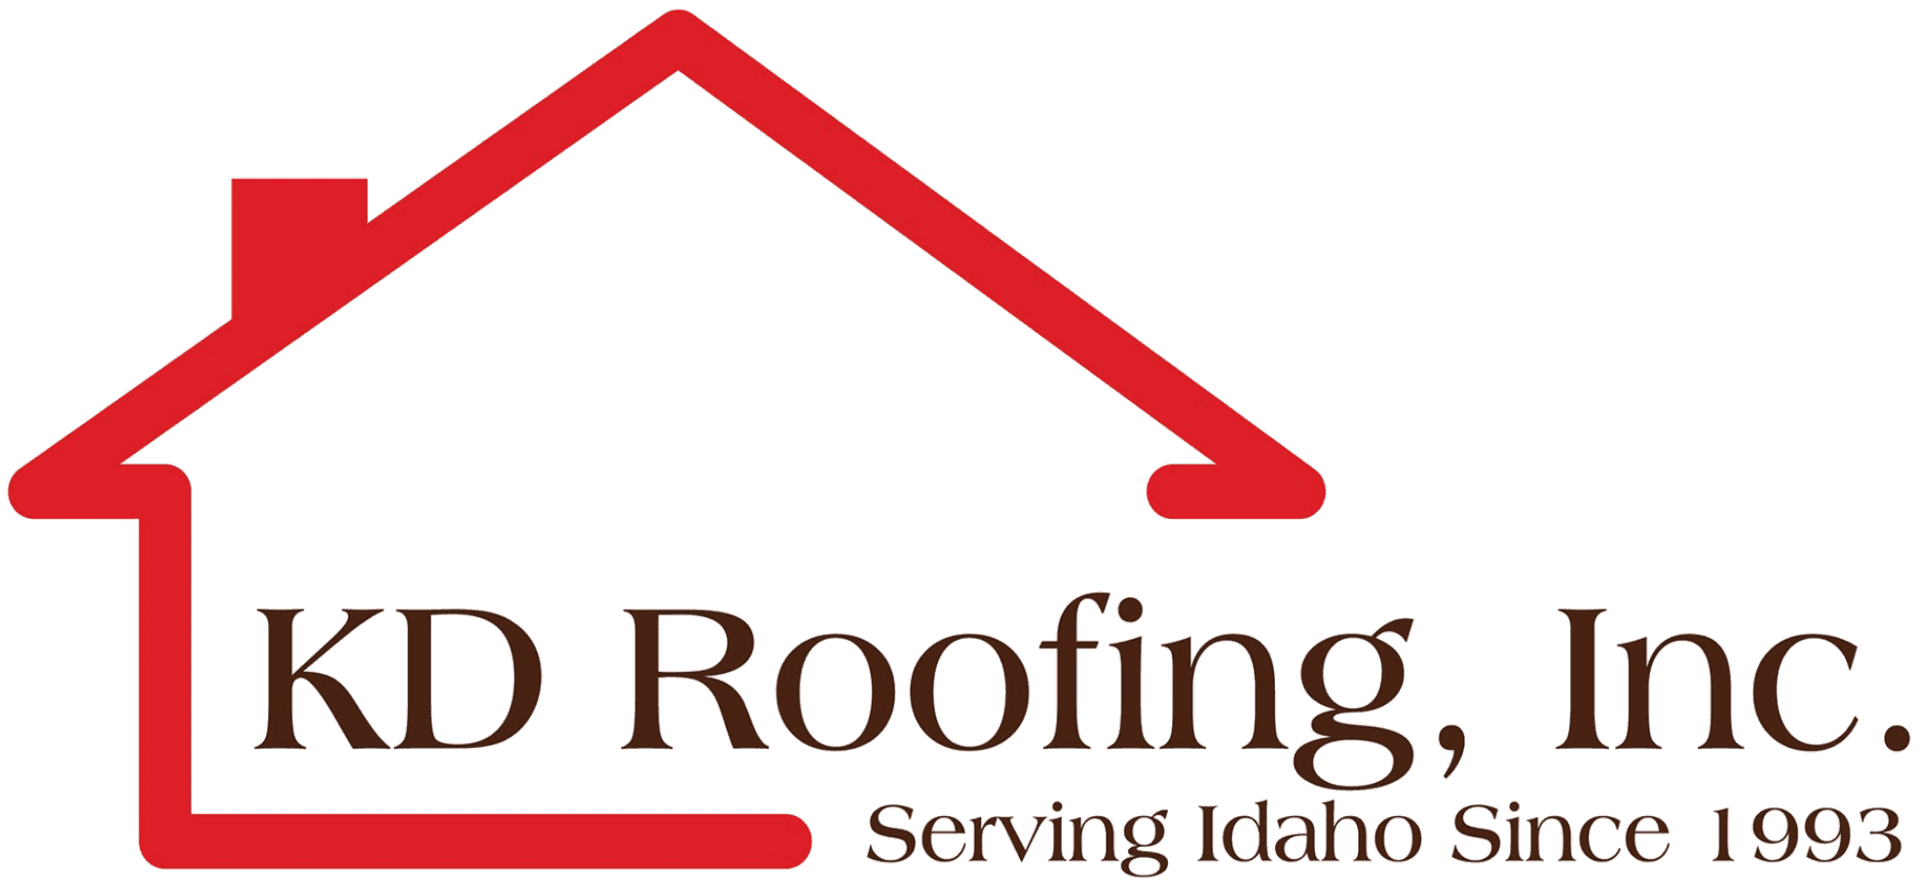 K D Roofing Inc. - logo